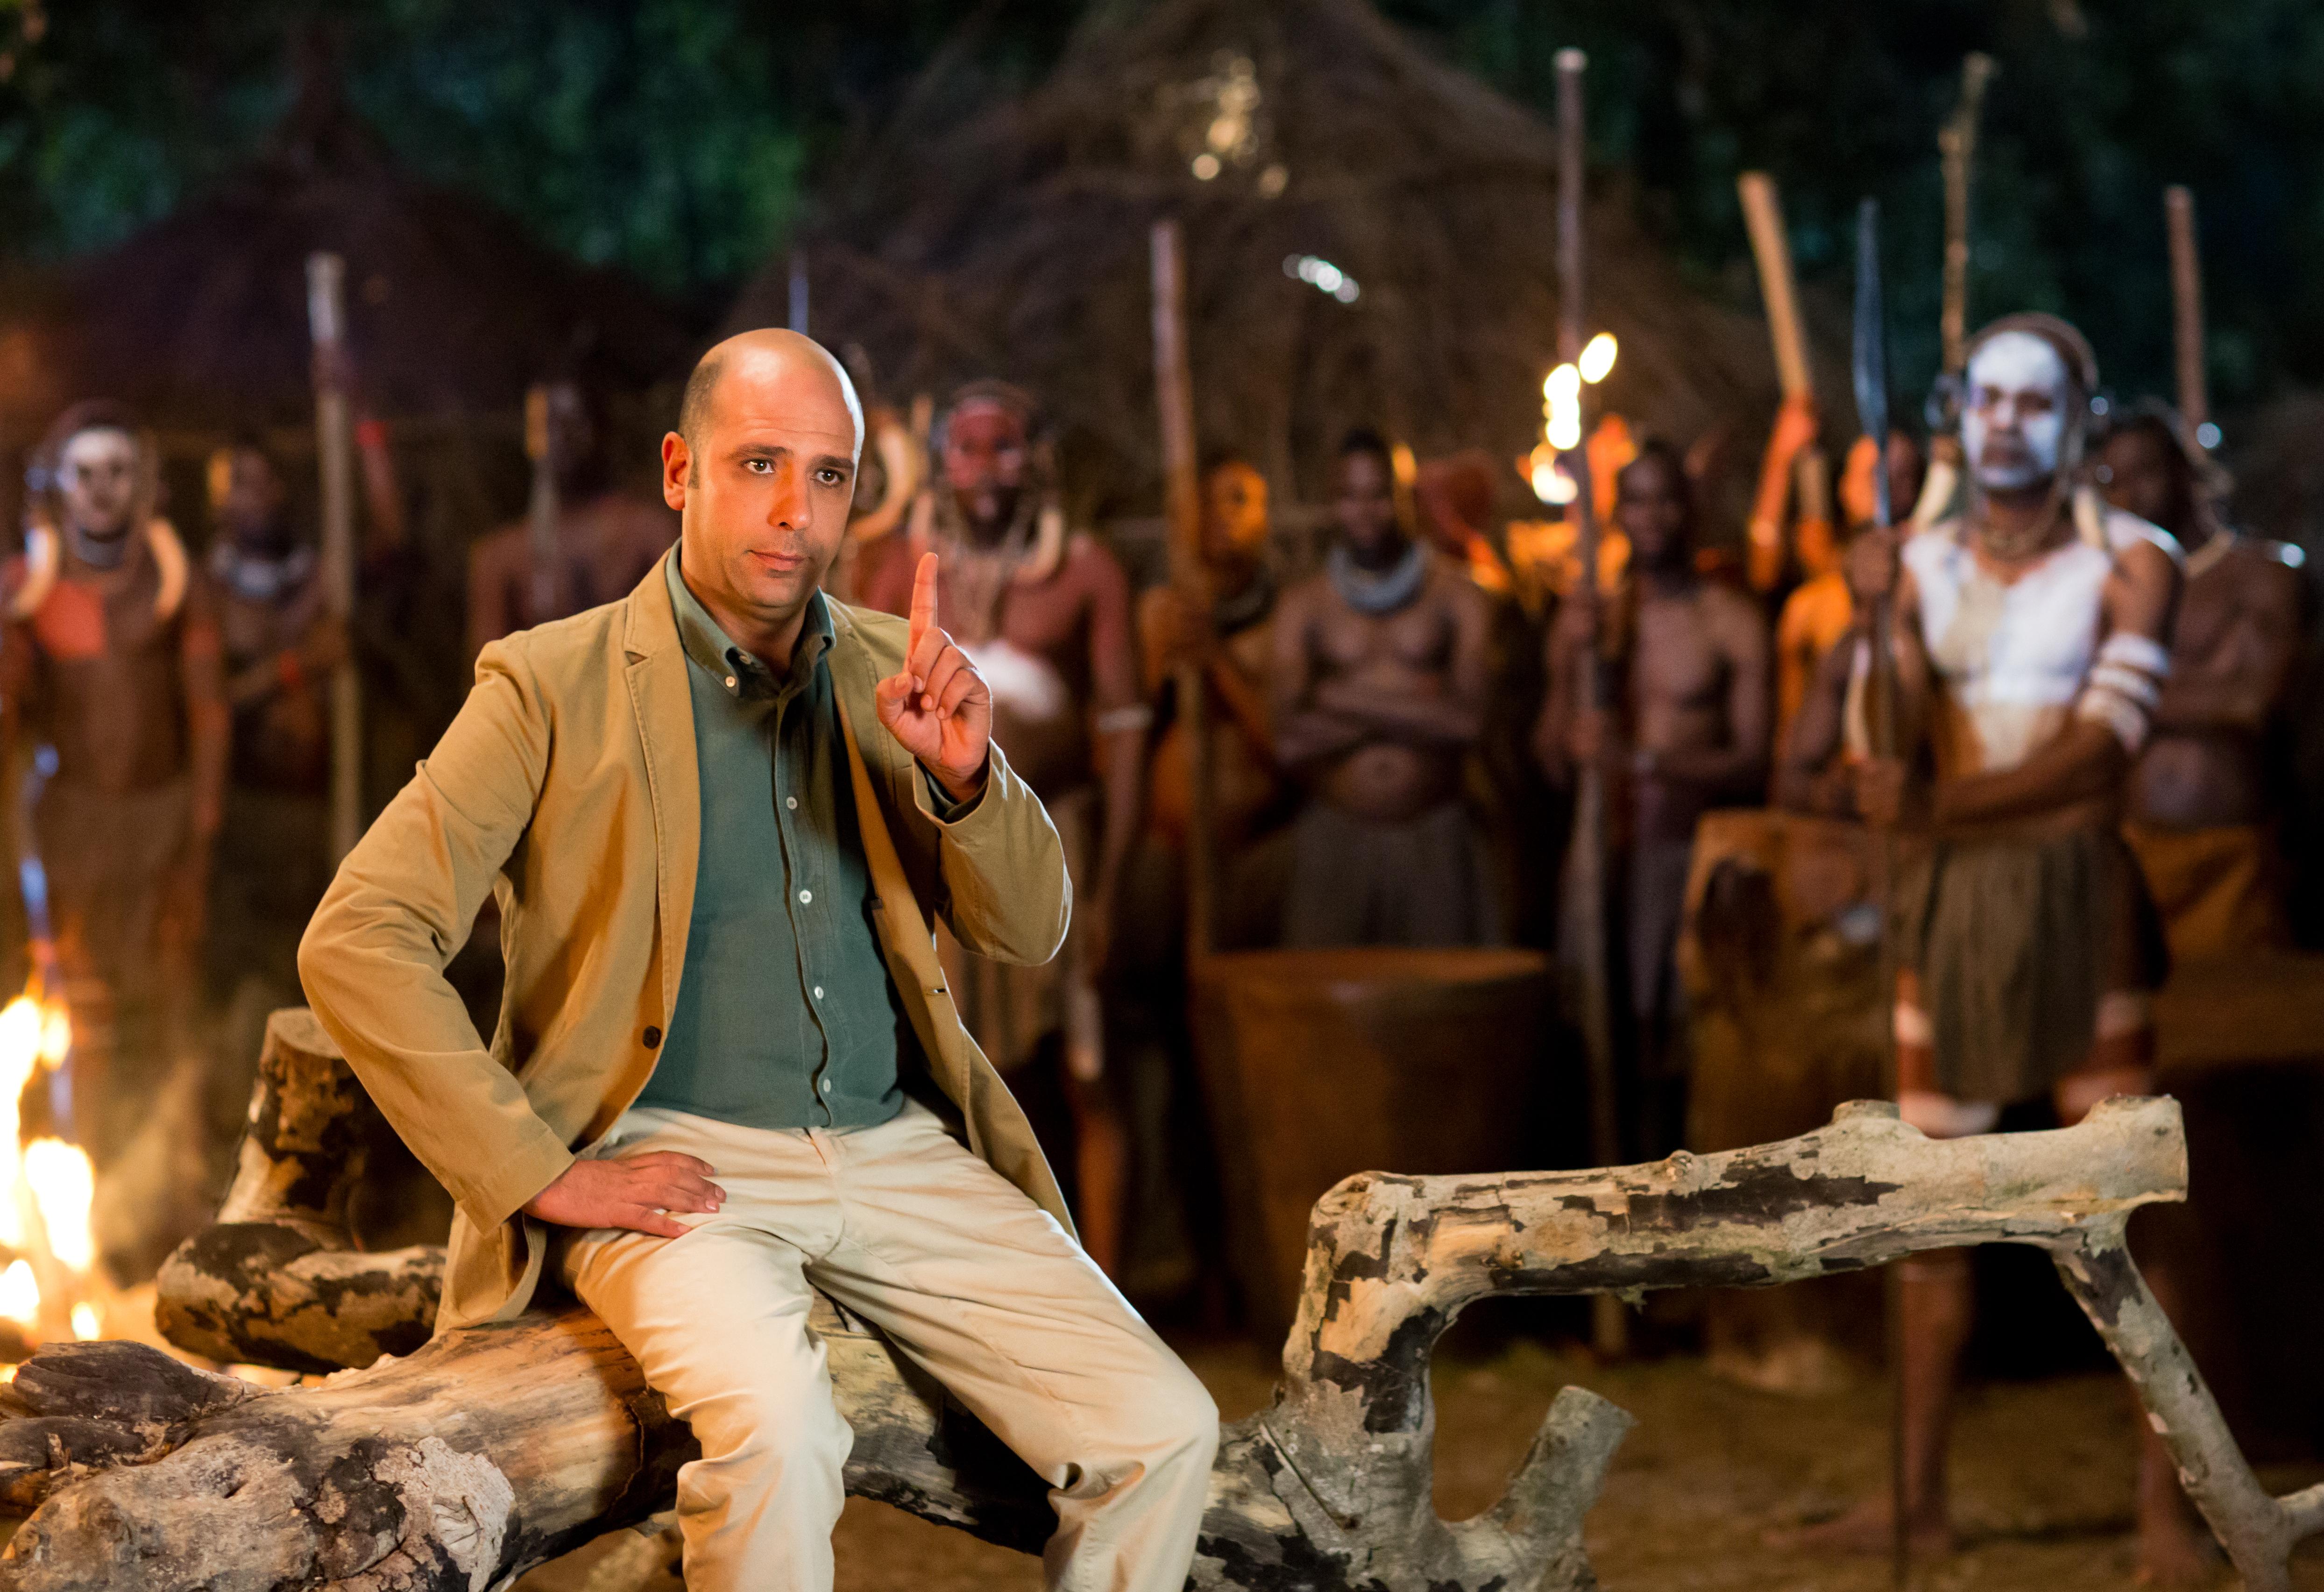 Zalone seduto sul ramo con tribu Zulu in Africa @MaurizioRaspante